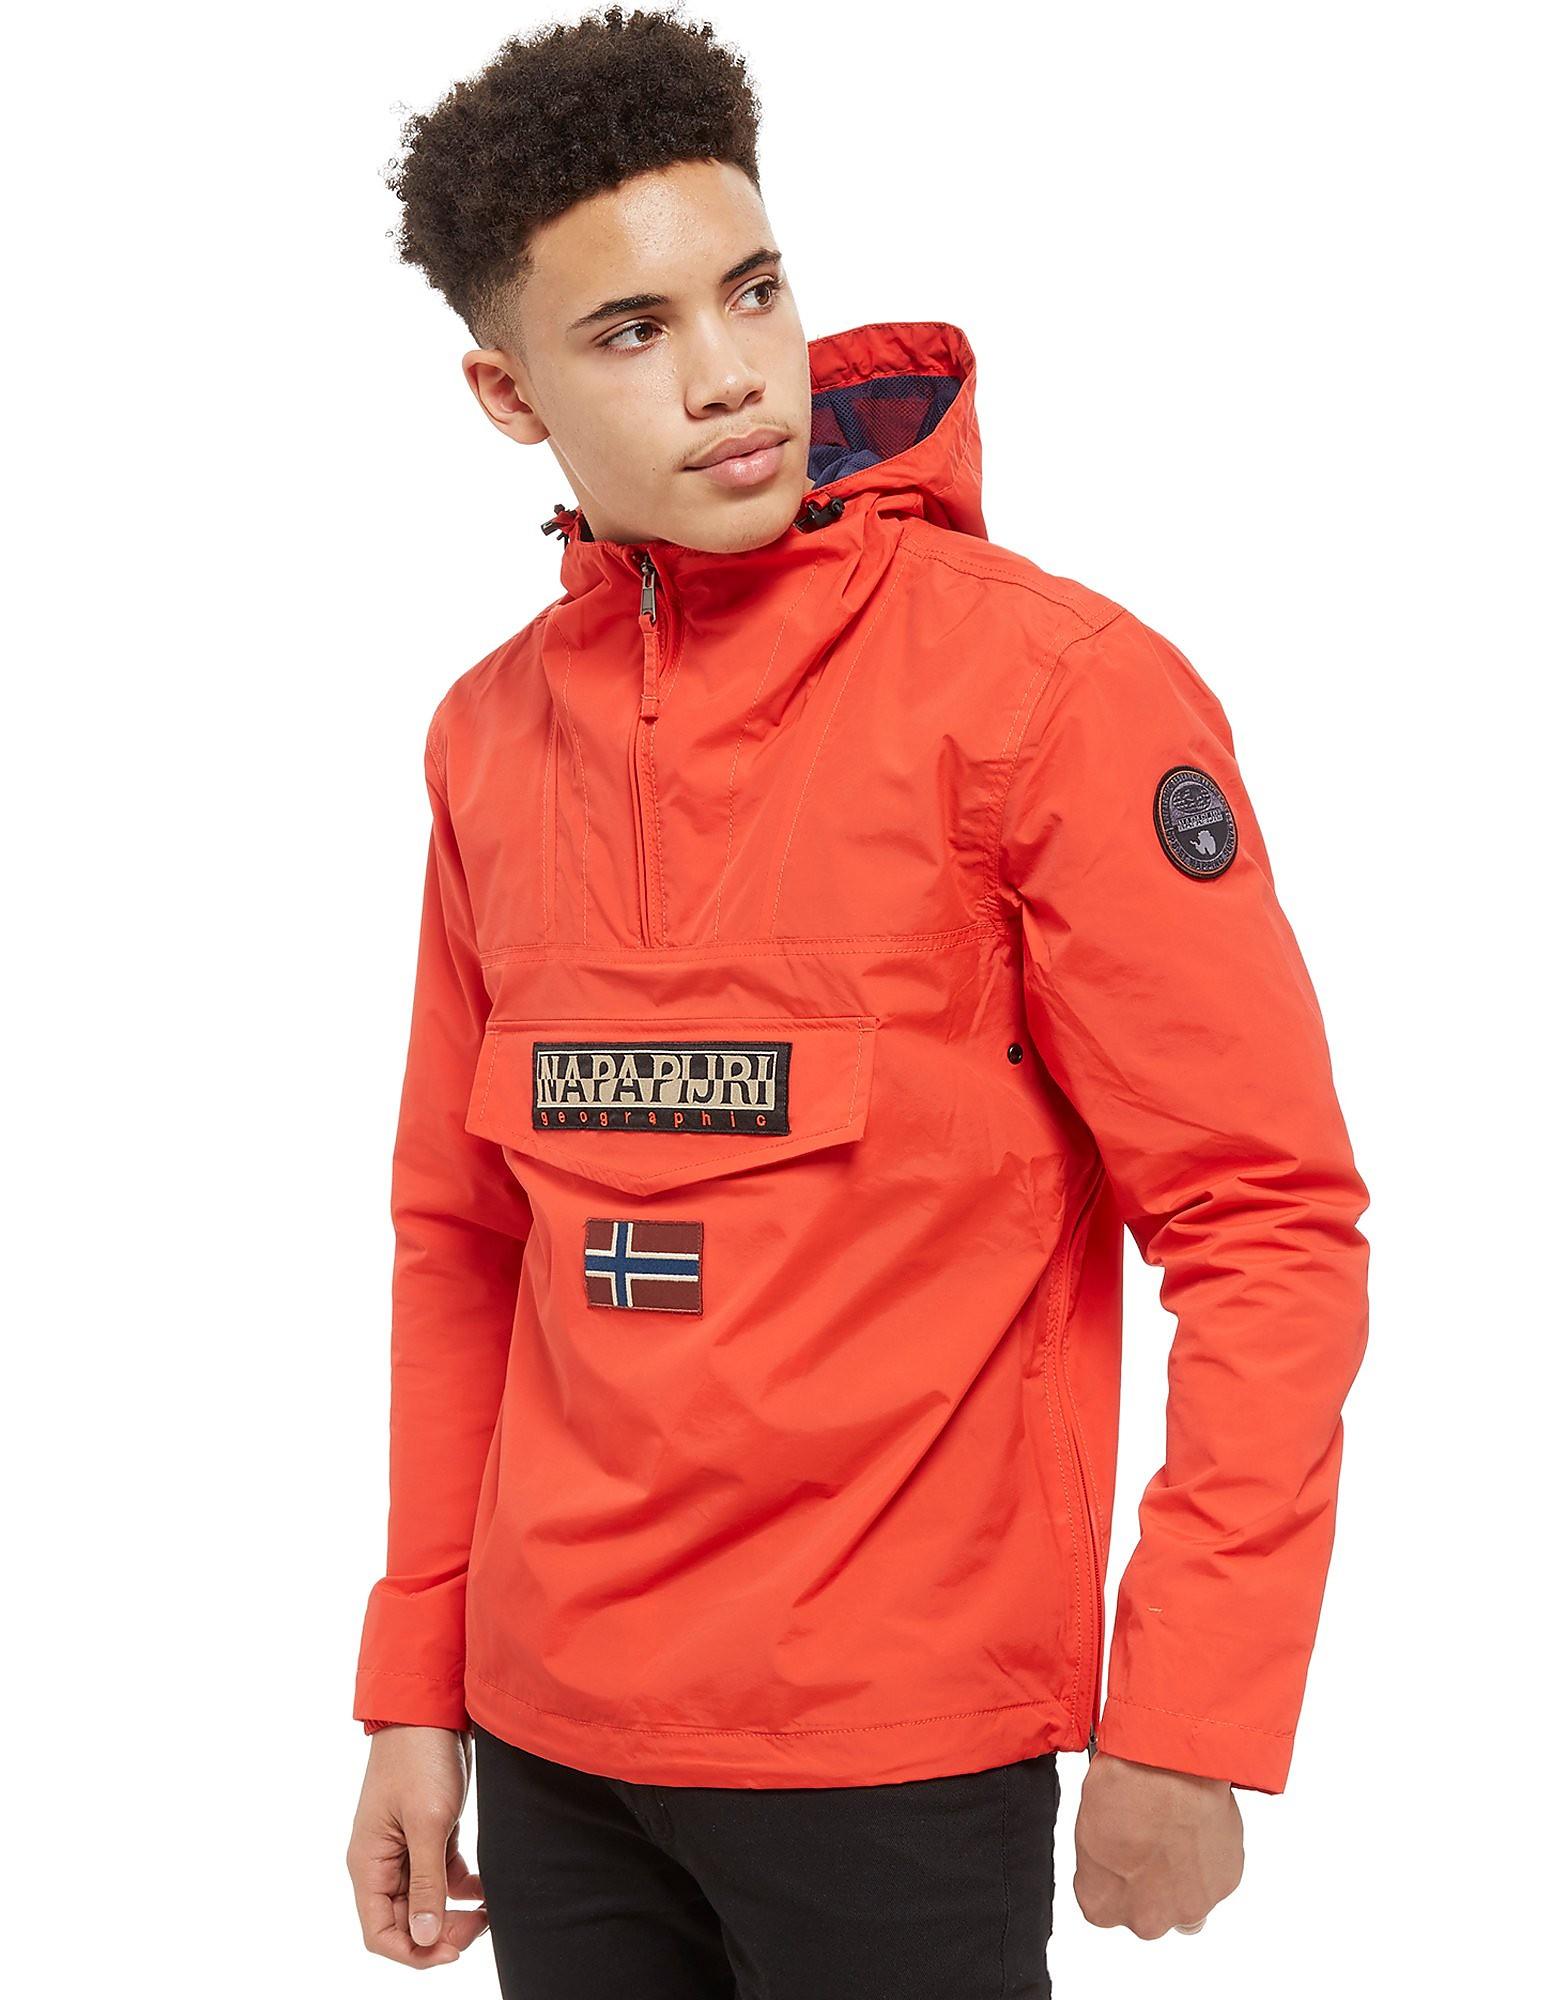 Napapijri chaqueta Rainforest